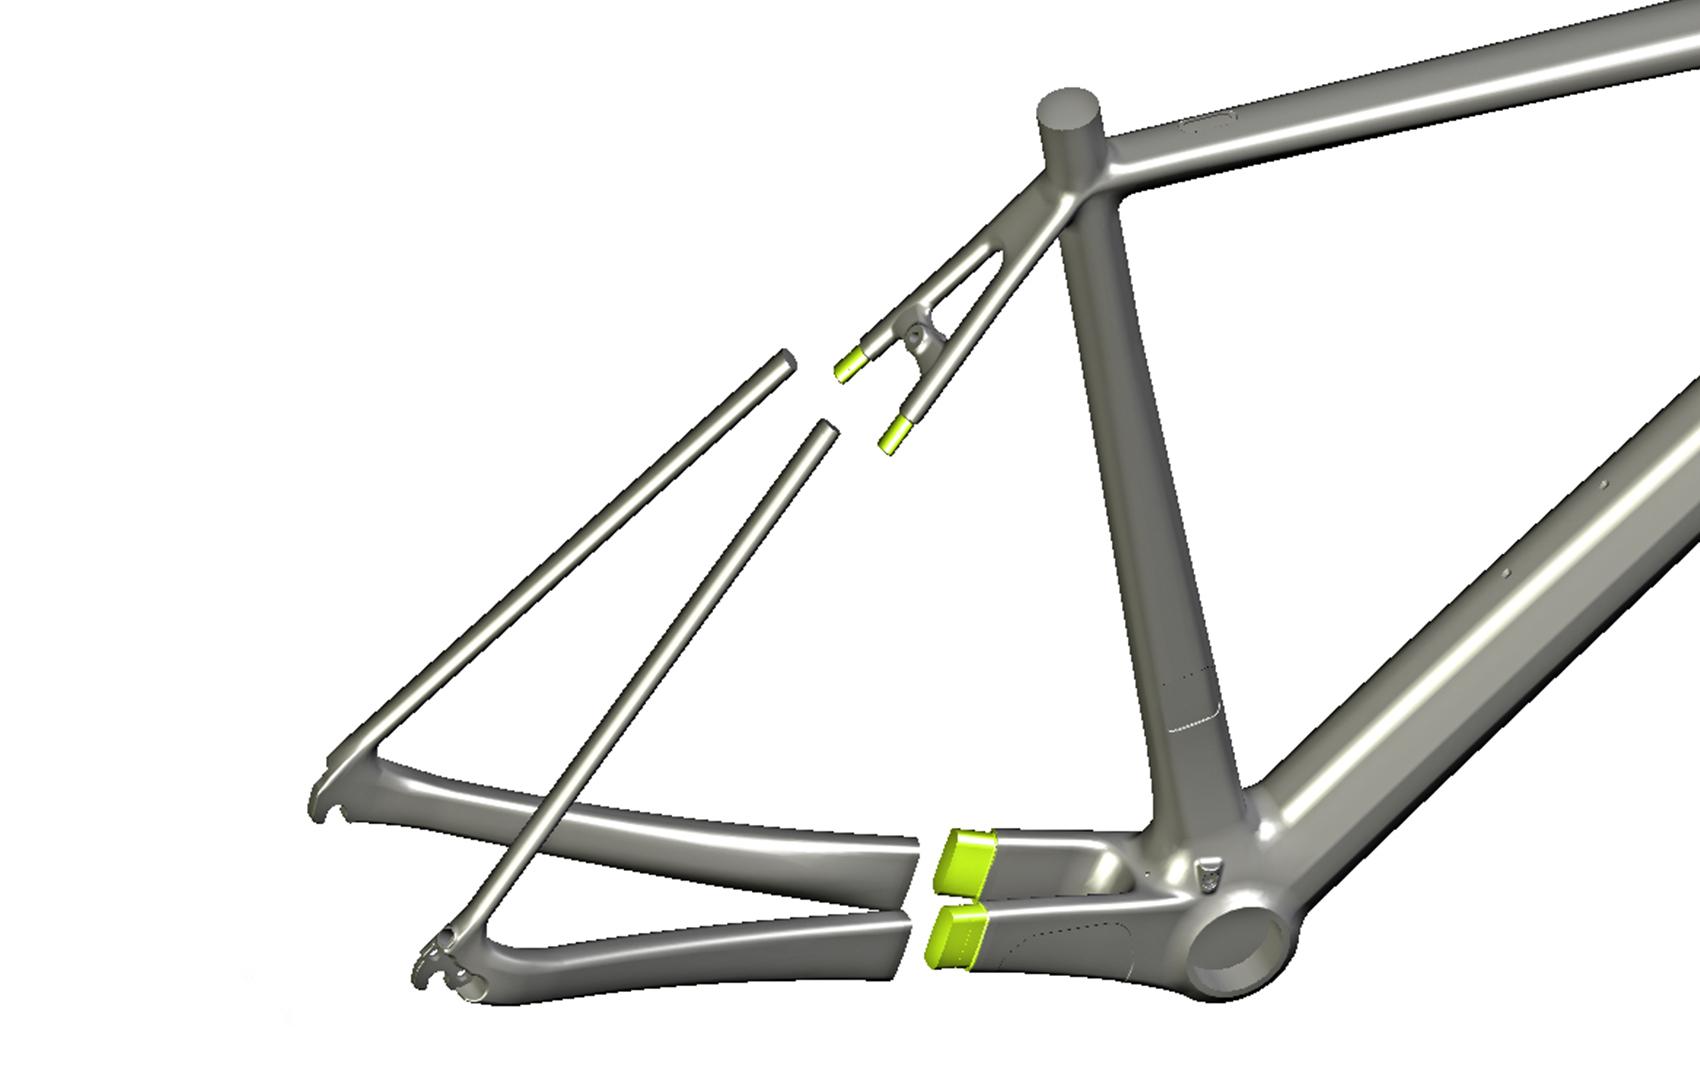 Fuji SL, frame van 695 gram   Fiets.nl - Race en MTB website